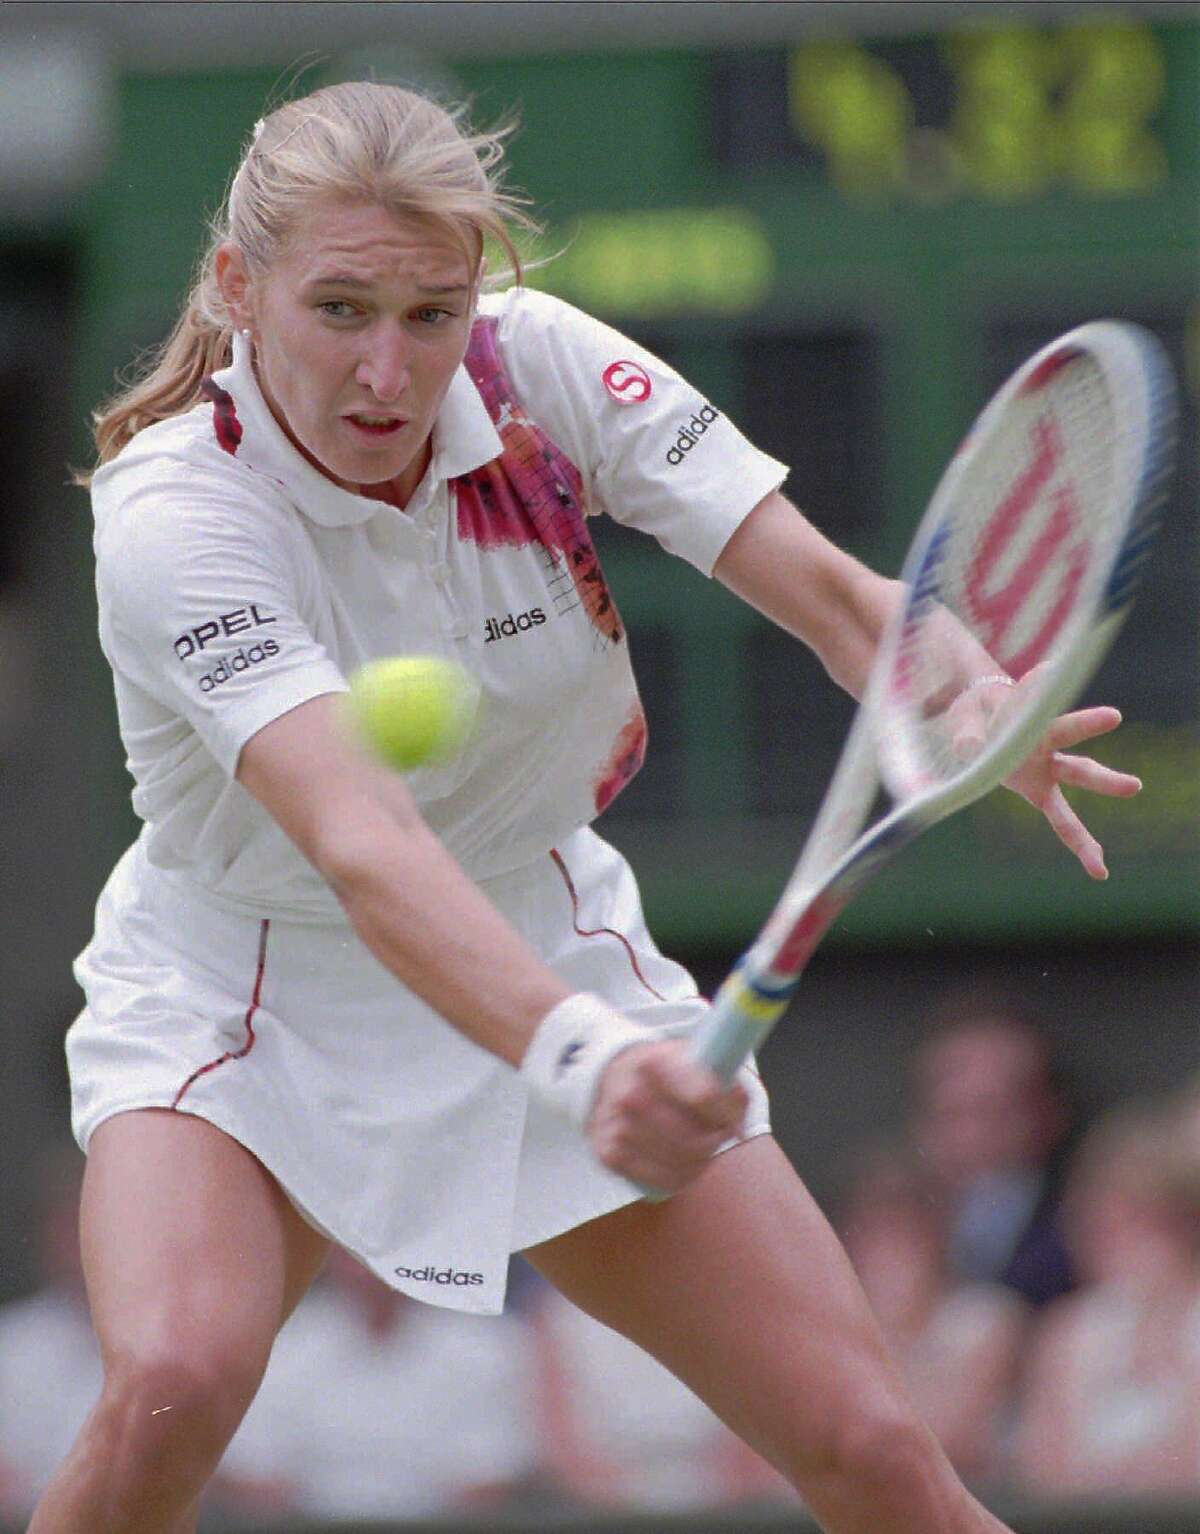 Steffi Graf returns to Mary Joe Fernandez, of the U.S. during their women's singles quarterfinal on Wimbledon's Center Court Tuesday July 4, 1995. Graf won the match 6-3, 6-0, and will play Jana Novotna in the semifinal. (AP Photo/Dave Caulkin)